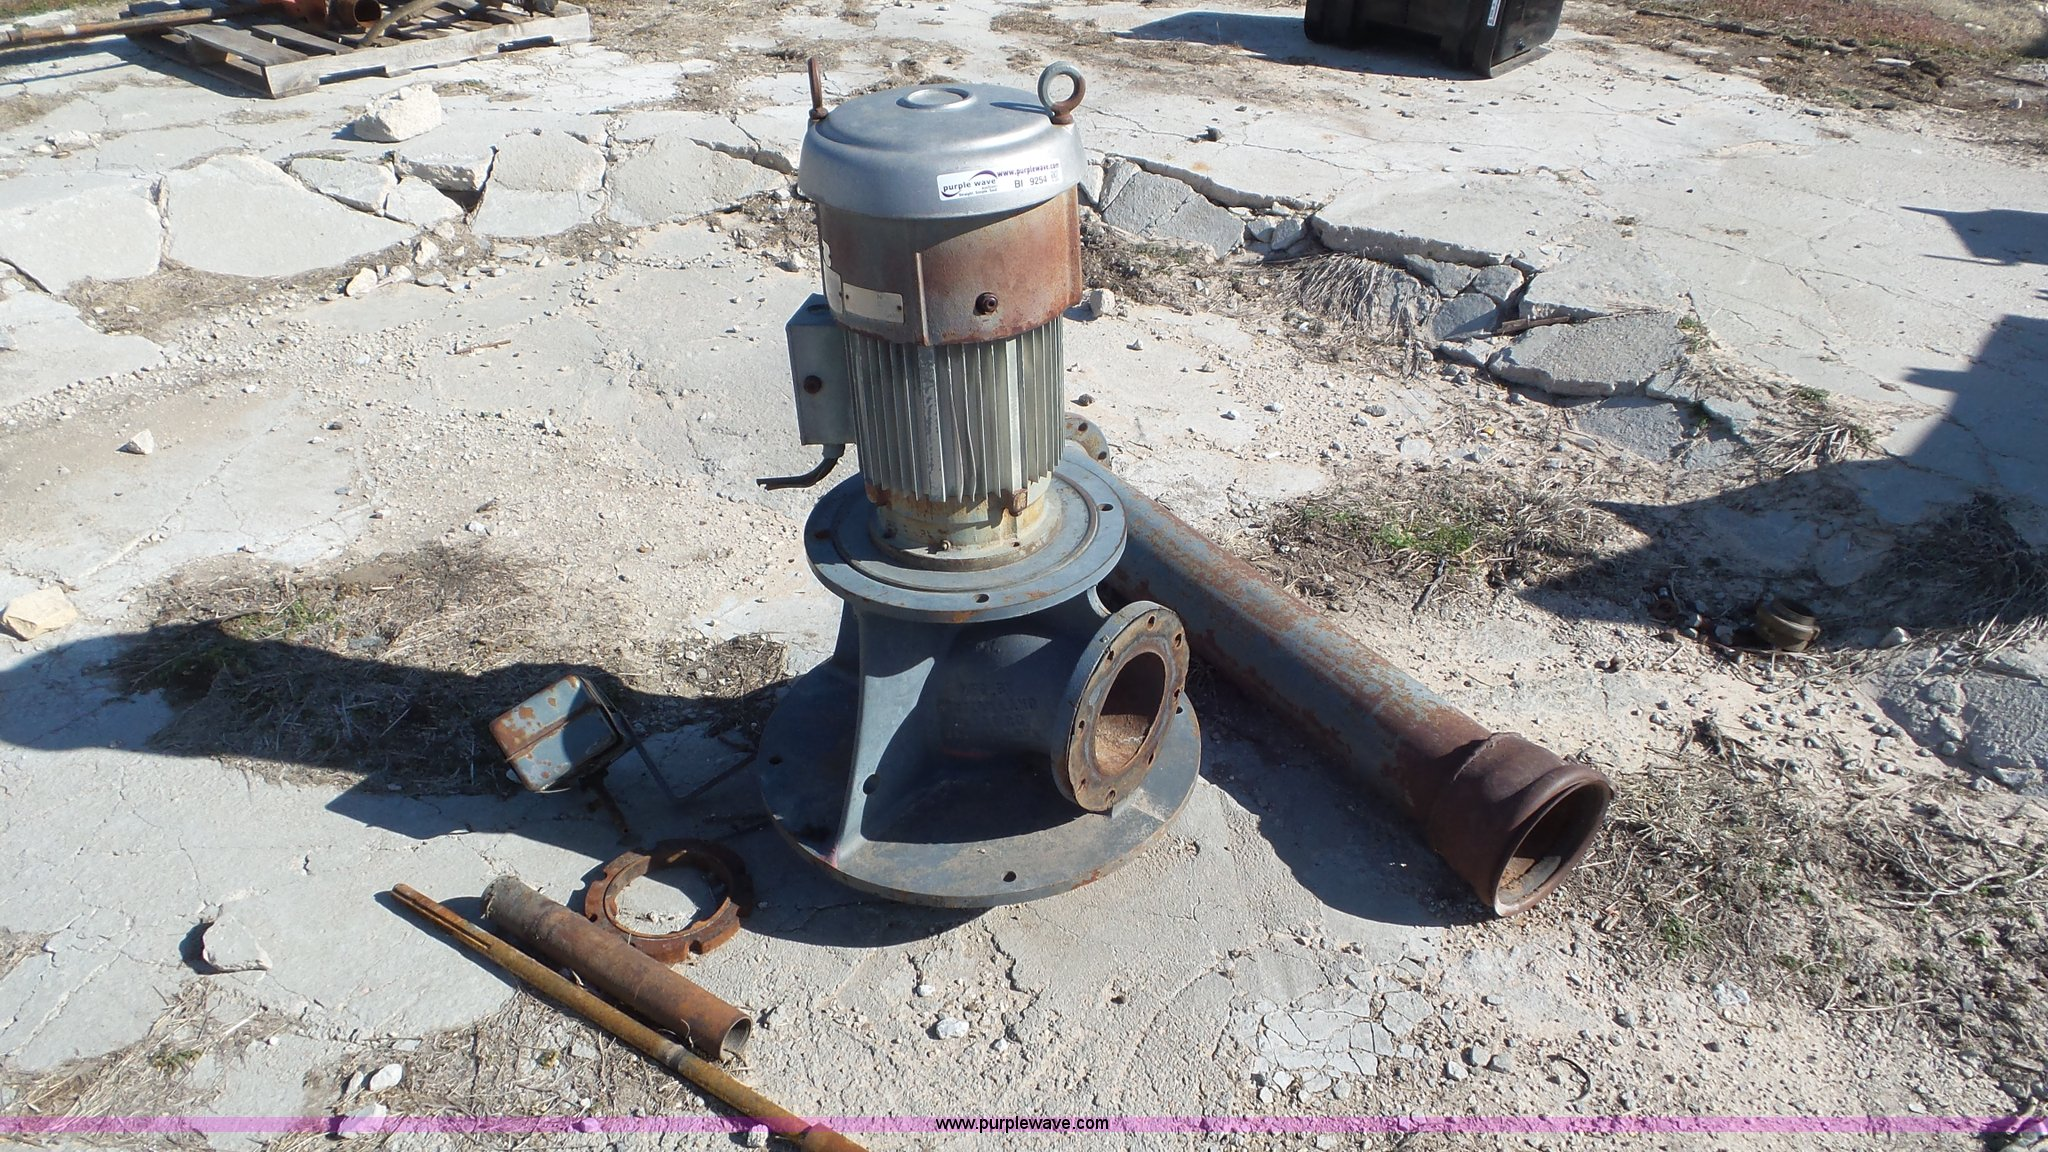 Western Land roller electric irrigation pump | Item BI9254 |